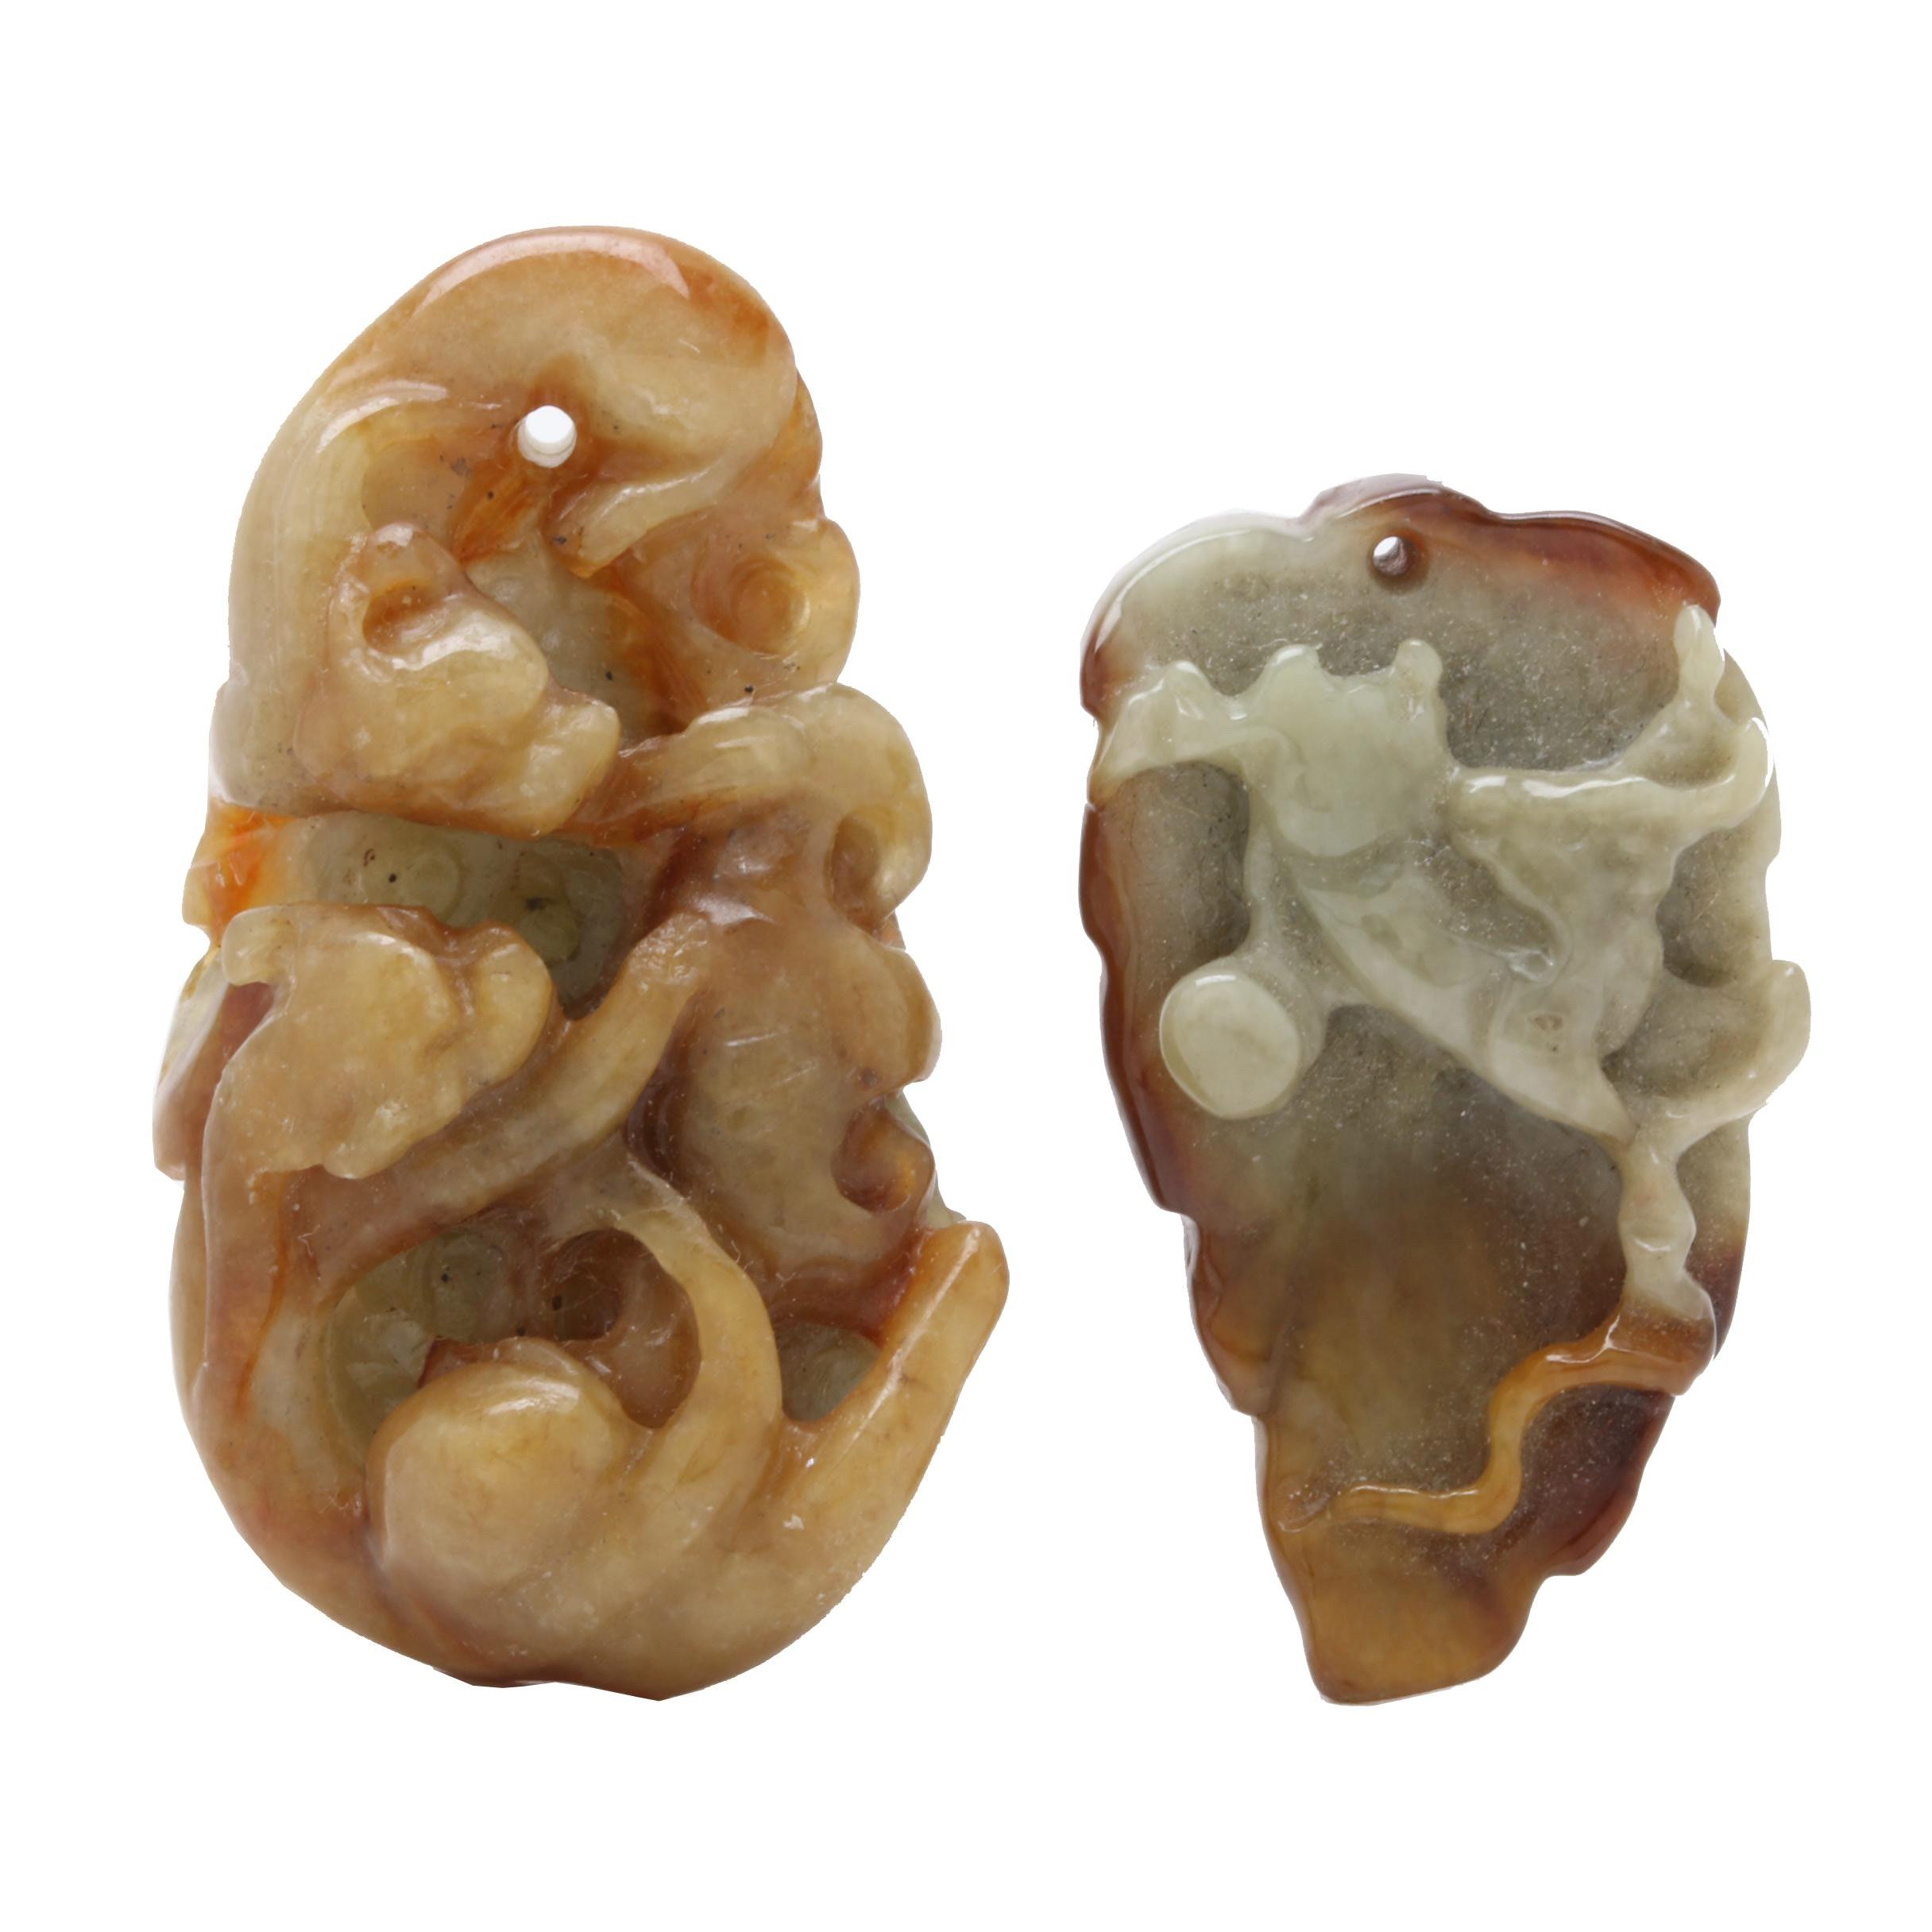 Chinese Carved Jadeite Pendants